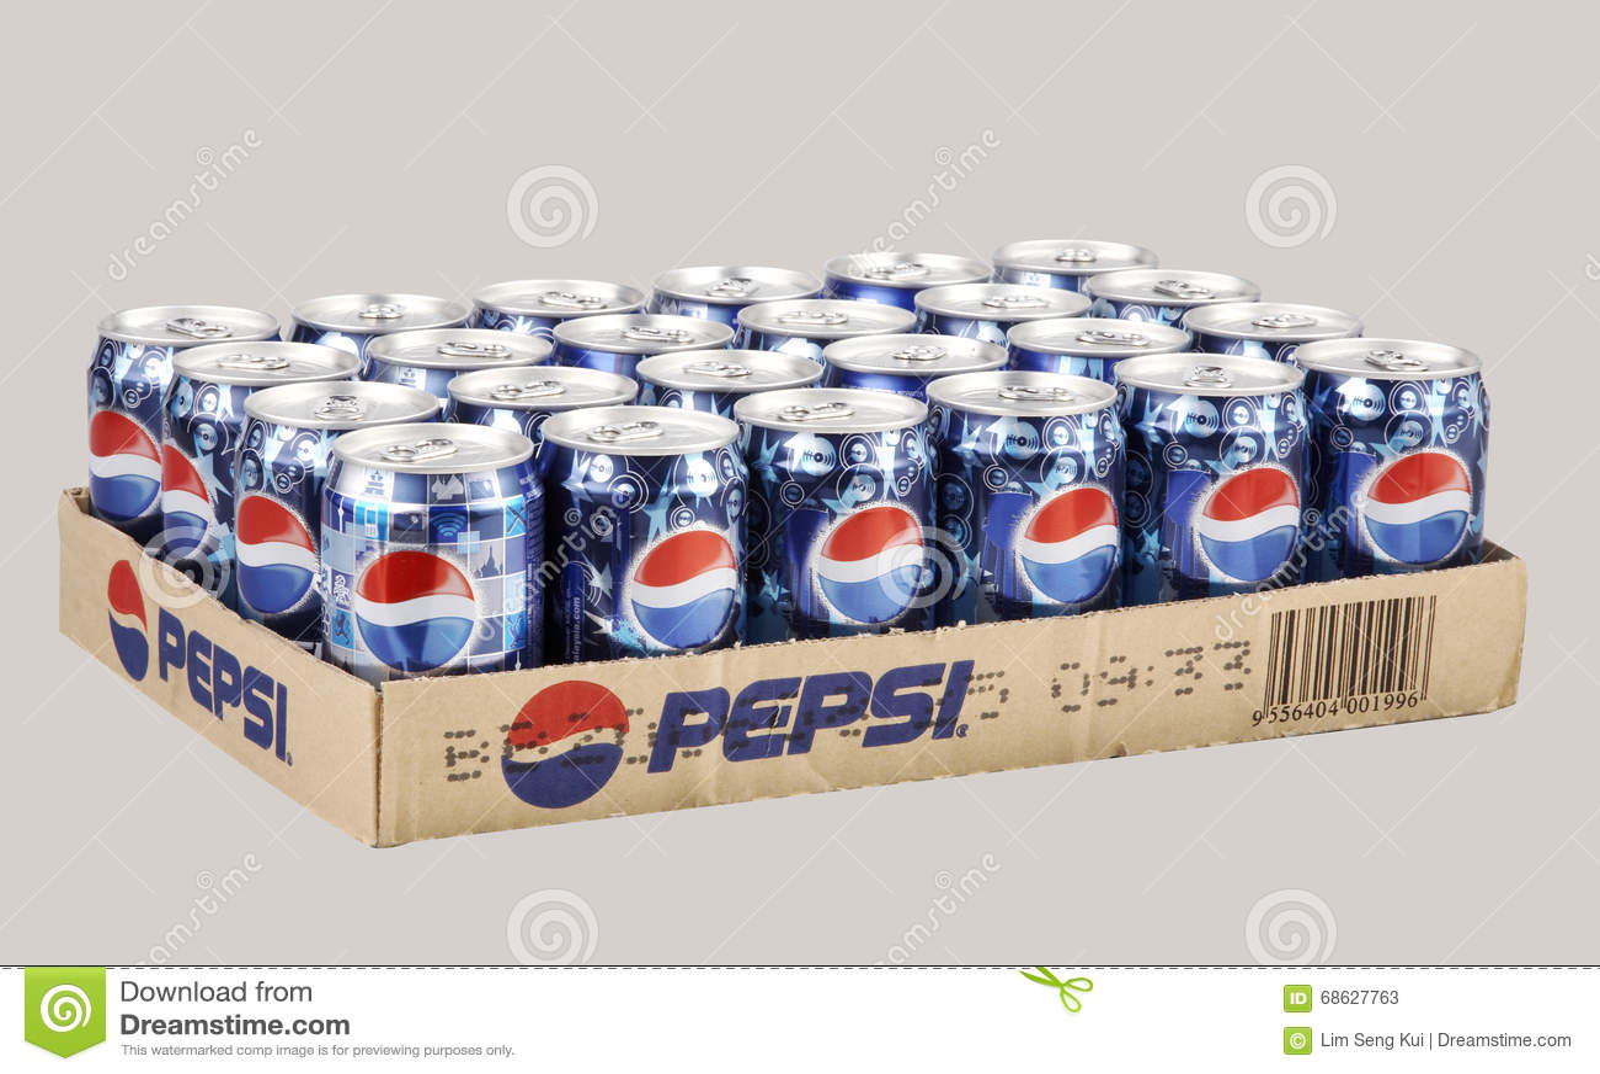 Pepsi editorial stock photo  Image of blue, illustrative - 68627763